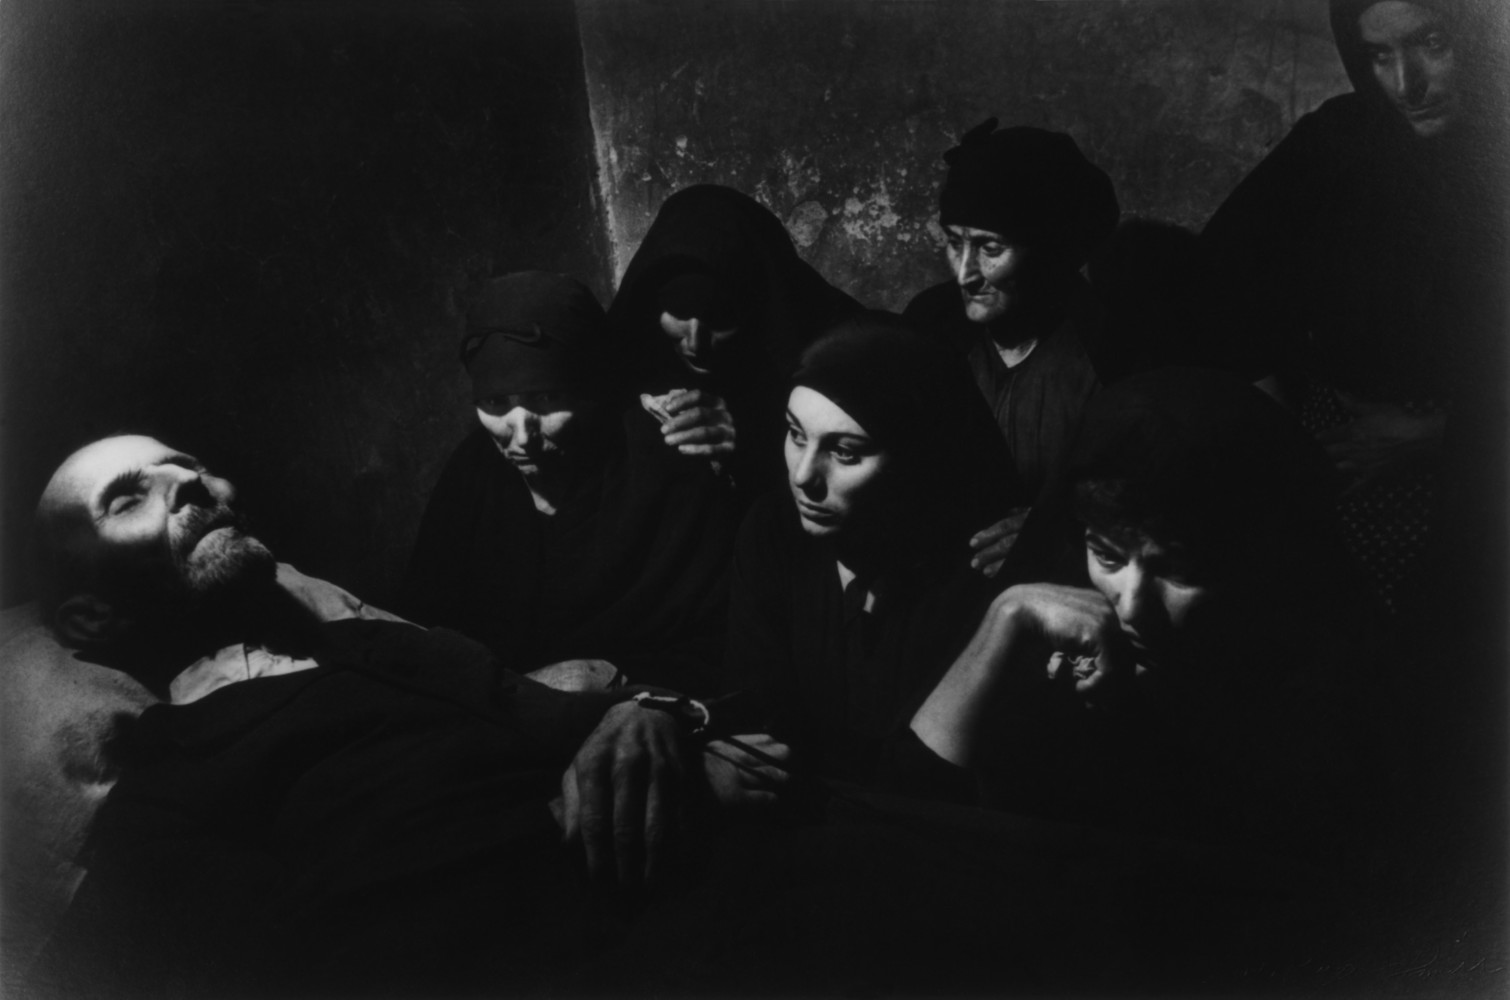 Fotó: W. Eugene Smith: Wake of Juan Carra Trujillo. From 'Spanish Village' photo-essay. Deleitosa, Province of Caceres, Extremadura, Spain. 1951 © Magnum Photos